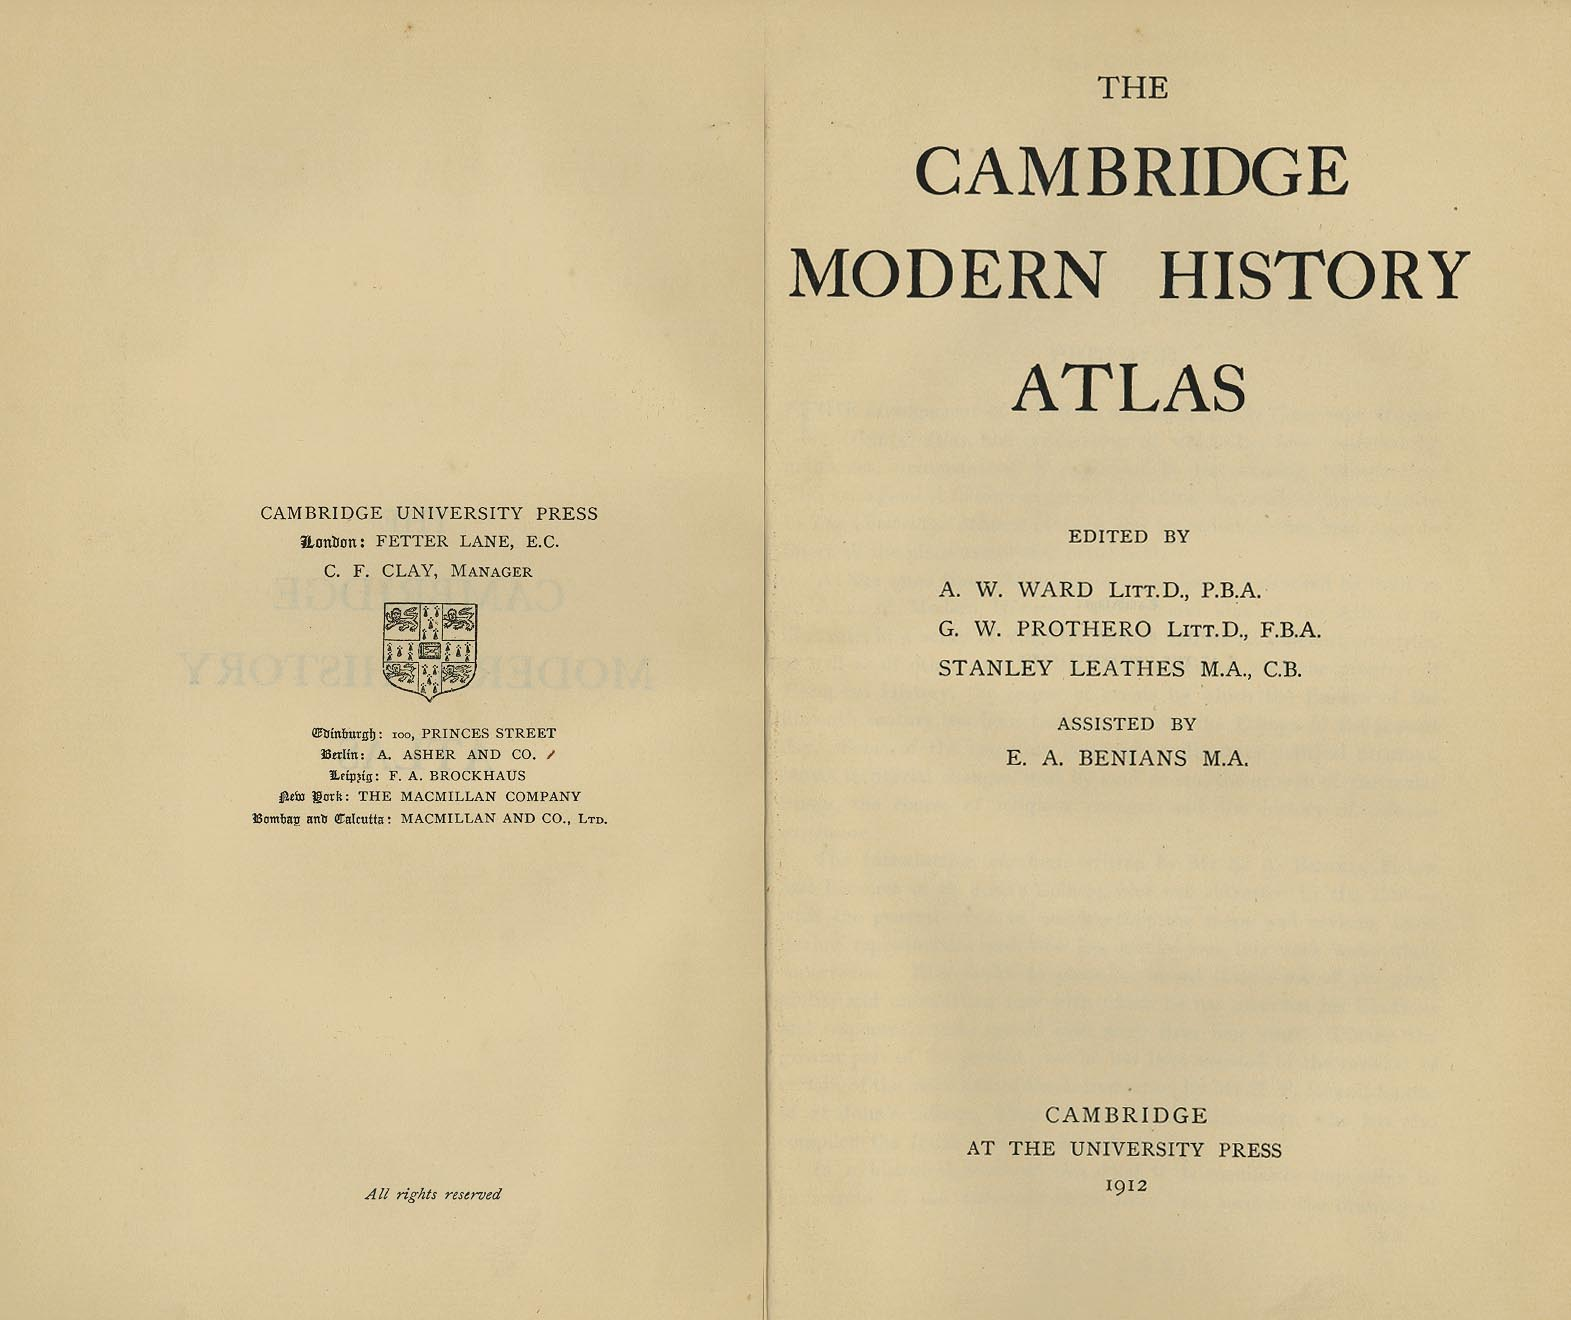 cambridge modern history atlas perry casta ntilde eda map title page